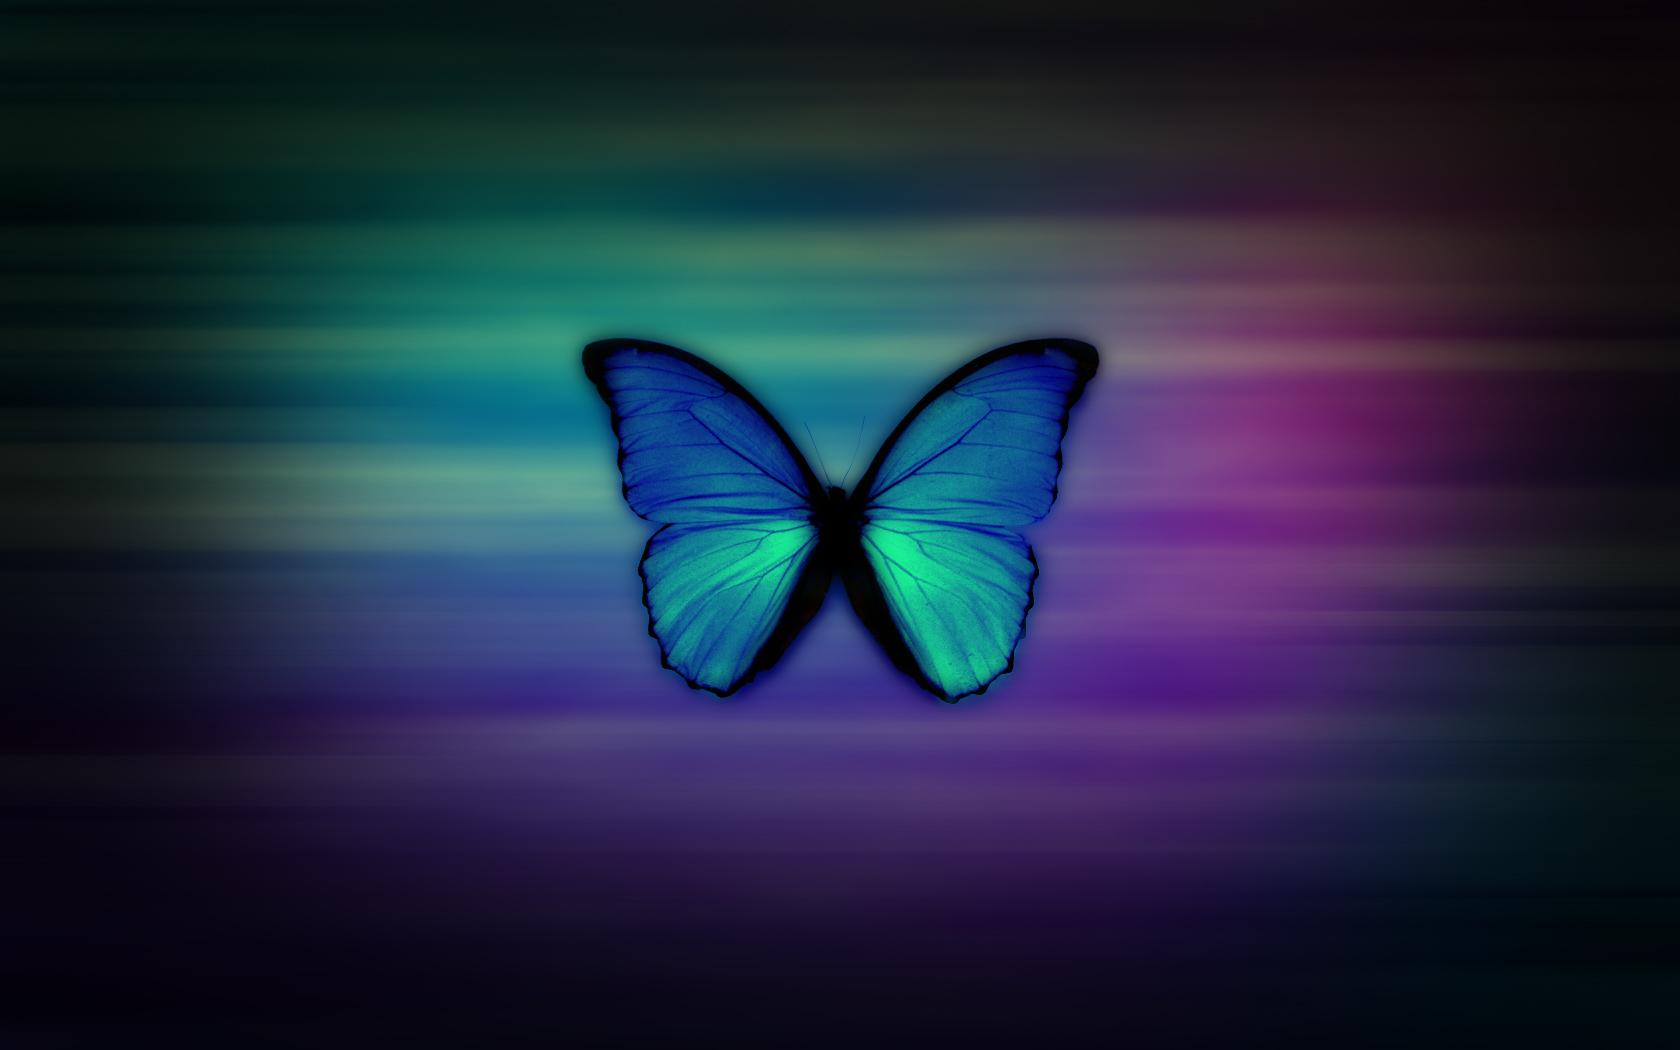 Butterfly Wallpapers HD 1680x1050